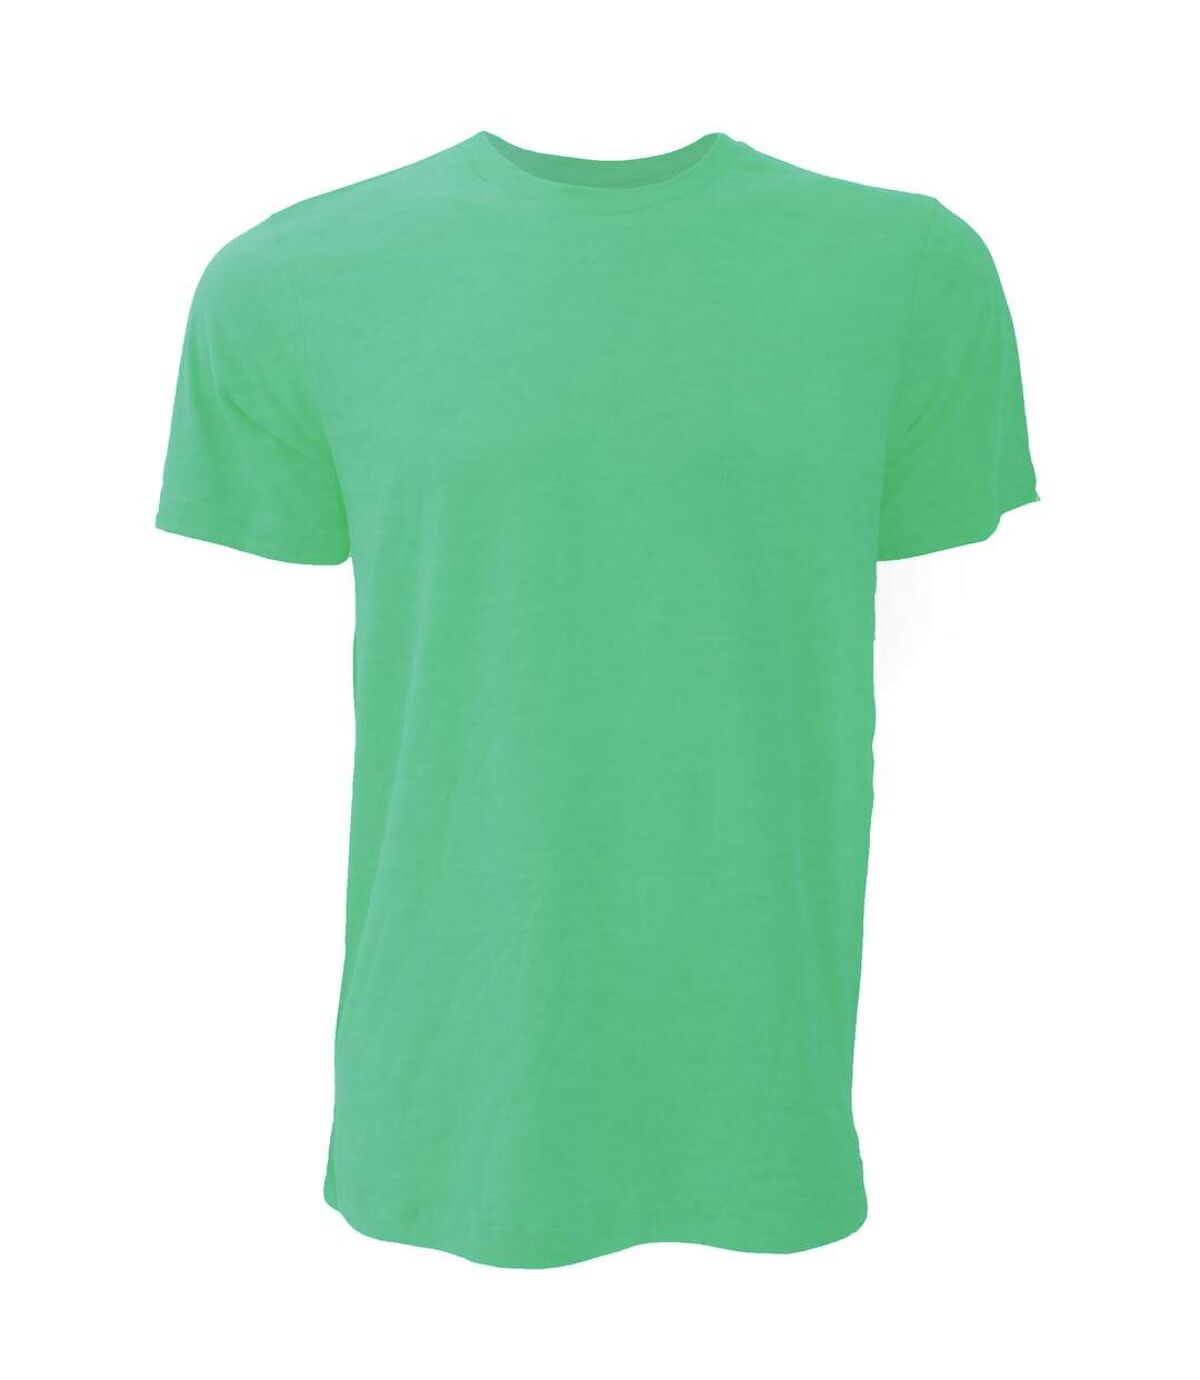 Canvas Unisex Jersey Crew Neck T-Shirt / Mens Short Sleeve T-Shirt (Heather Kelly Green) - UTBC163